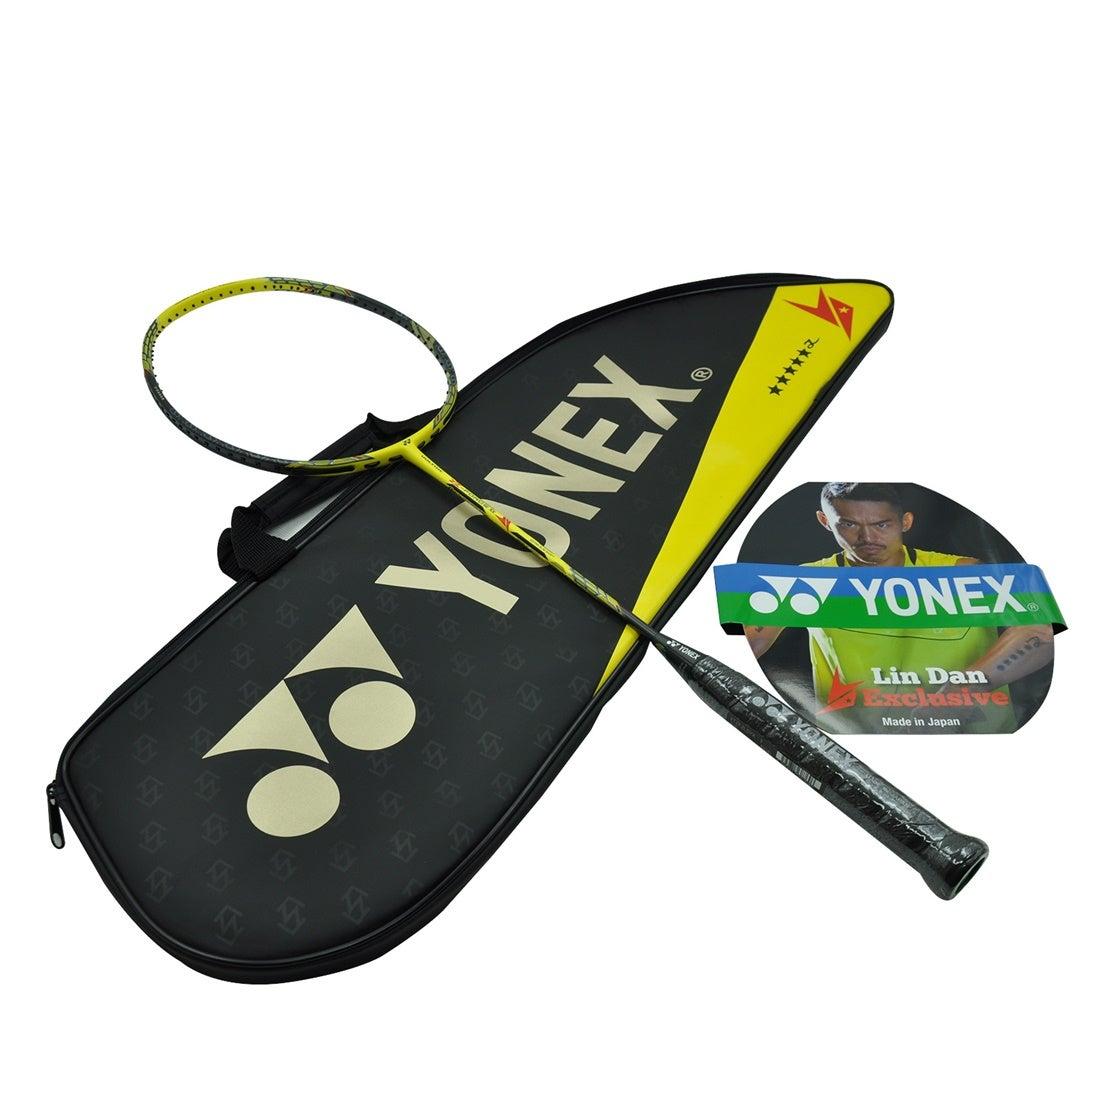 Yonex Badminton Racquet Voltric Z Force II Limited Edition LIN DAN - 3U5 - Free One Grip